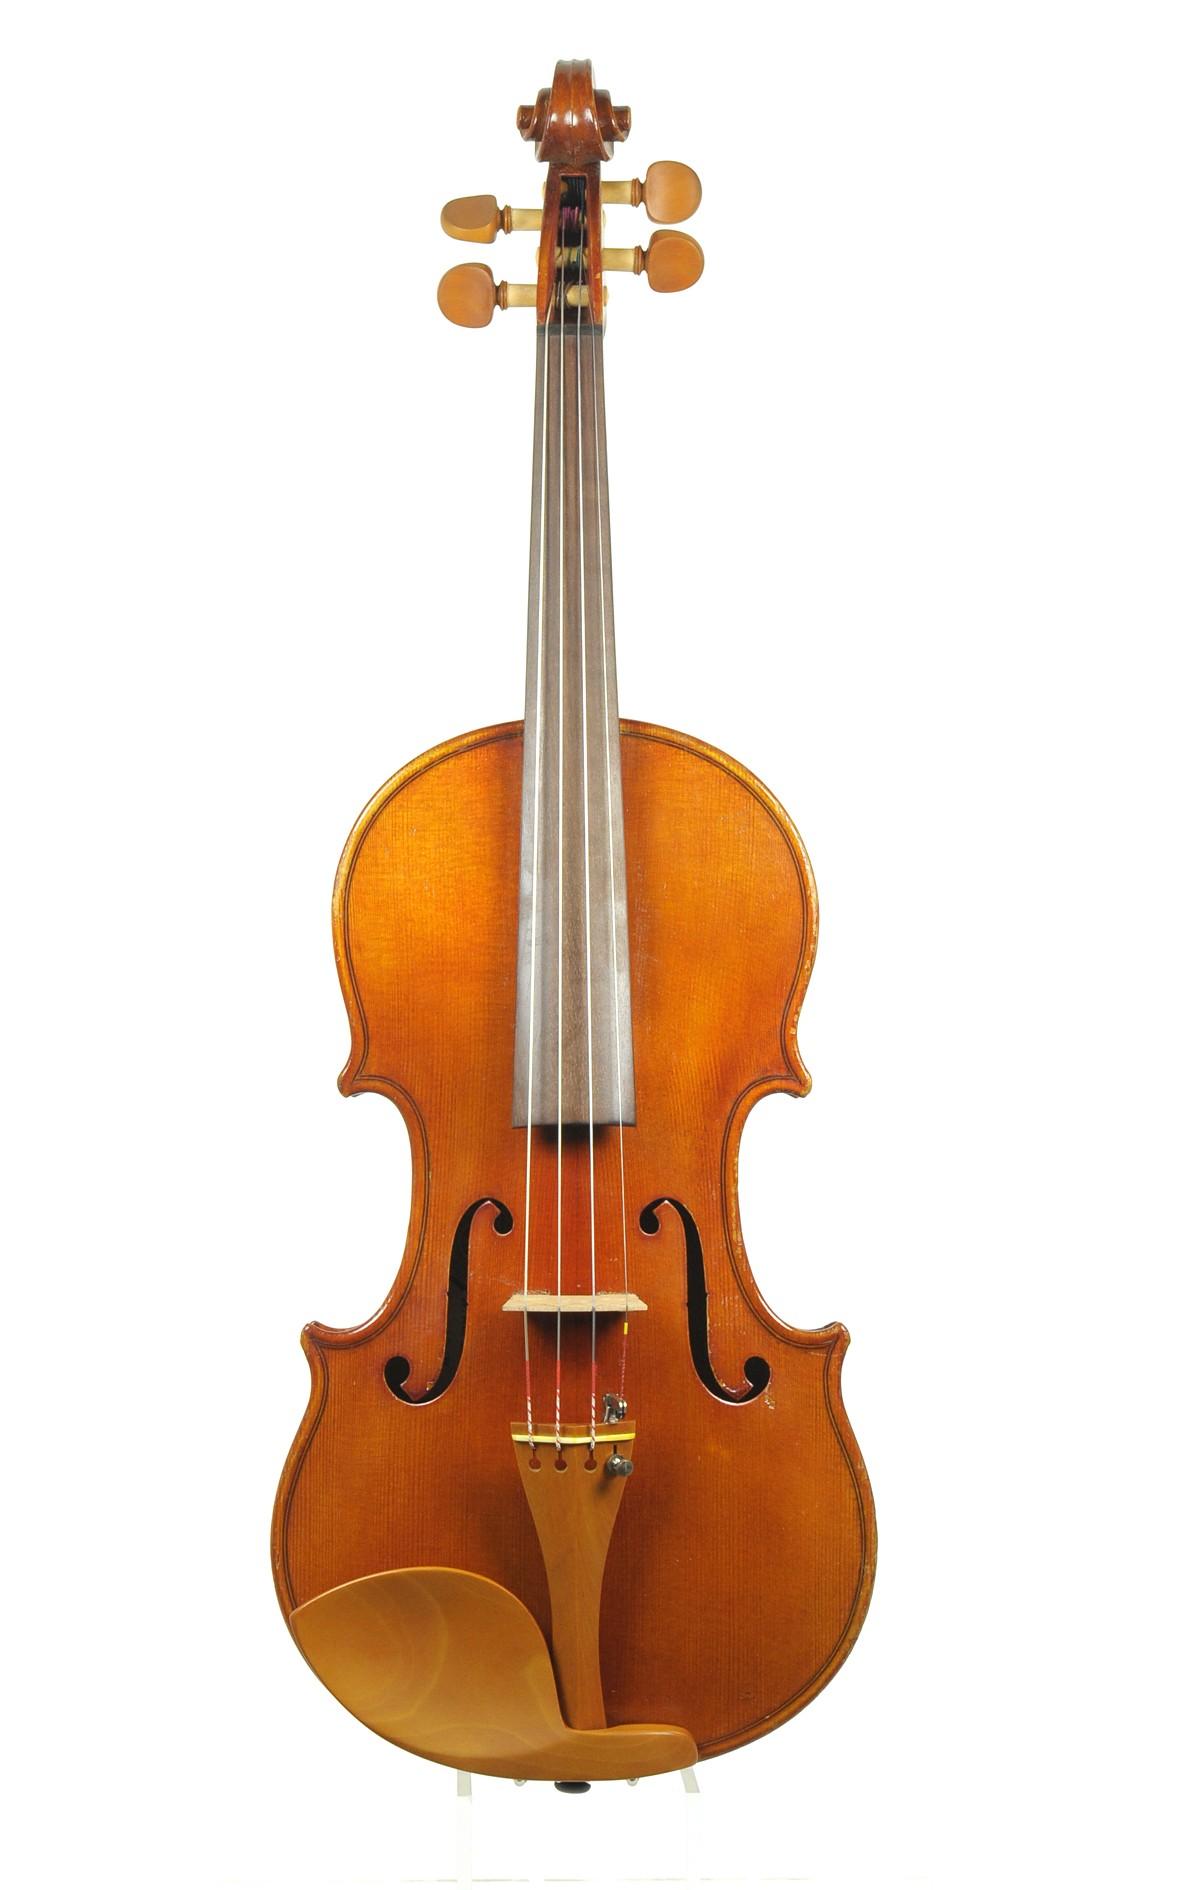 Old German violin, Saxony approx. 1910 - top view